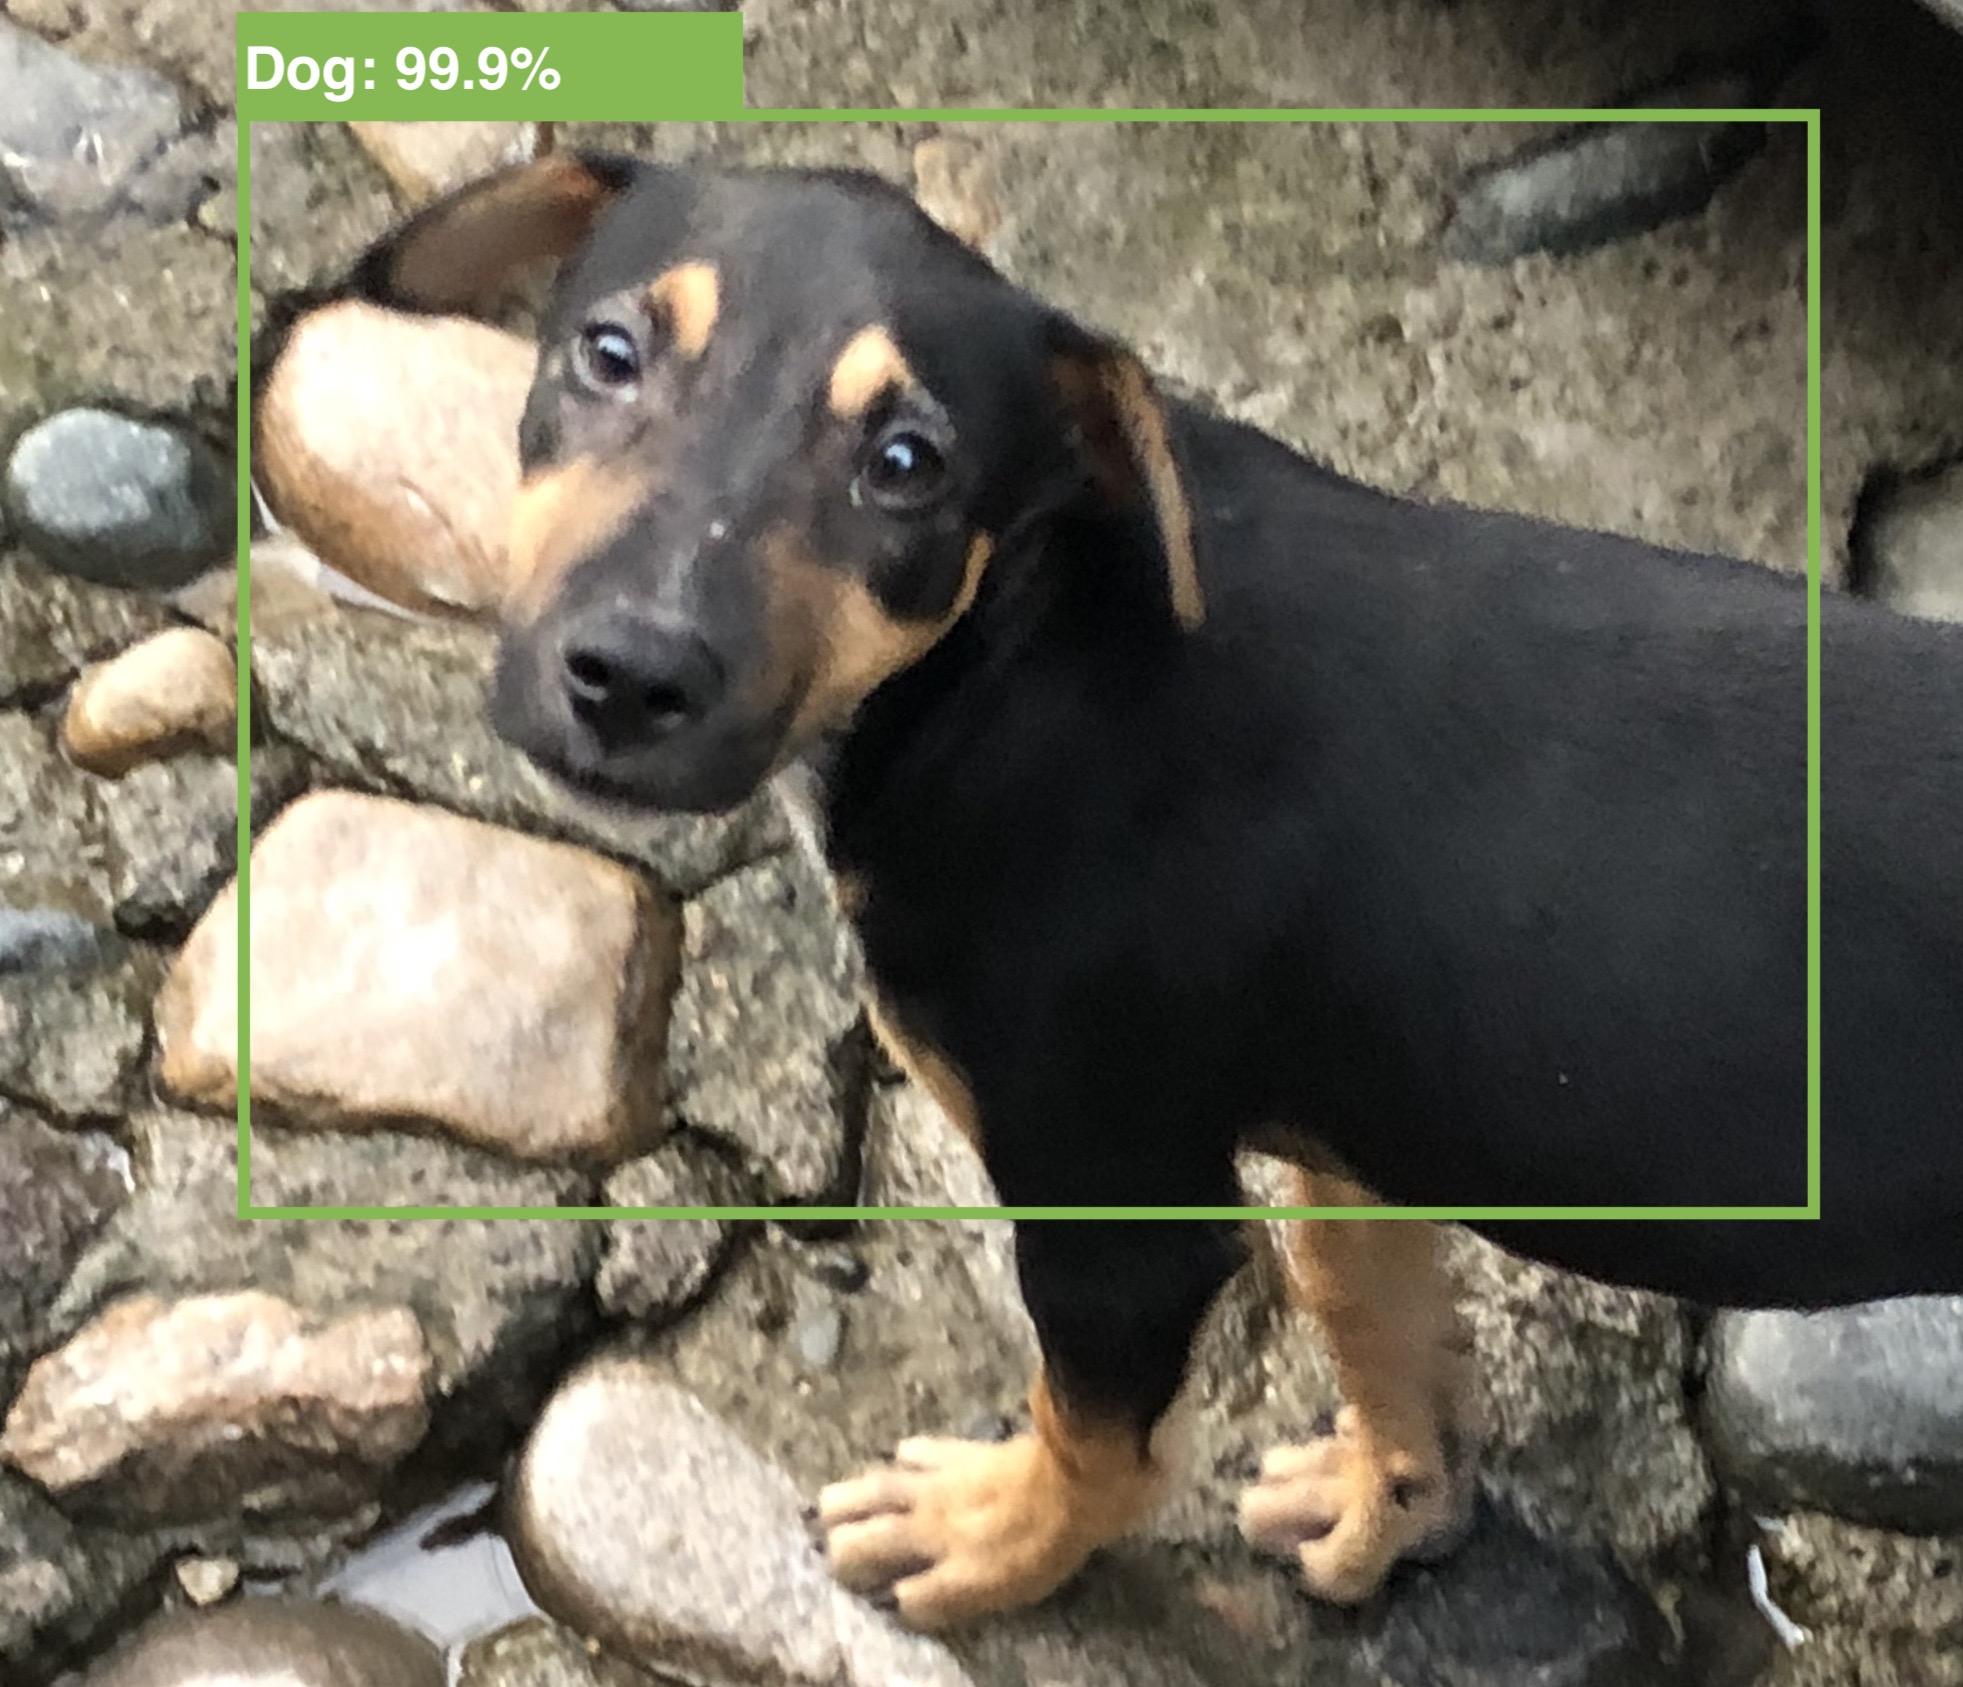 VNAnimalDetectorDog knows this is a good doggo